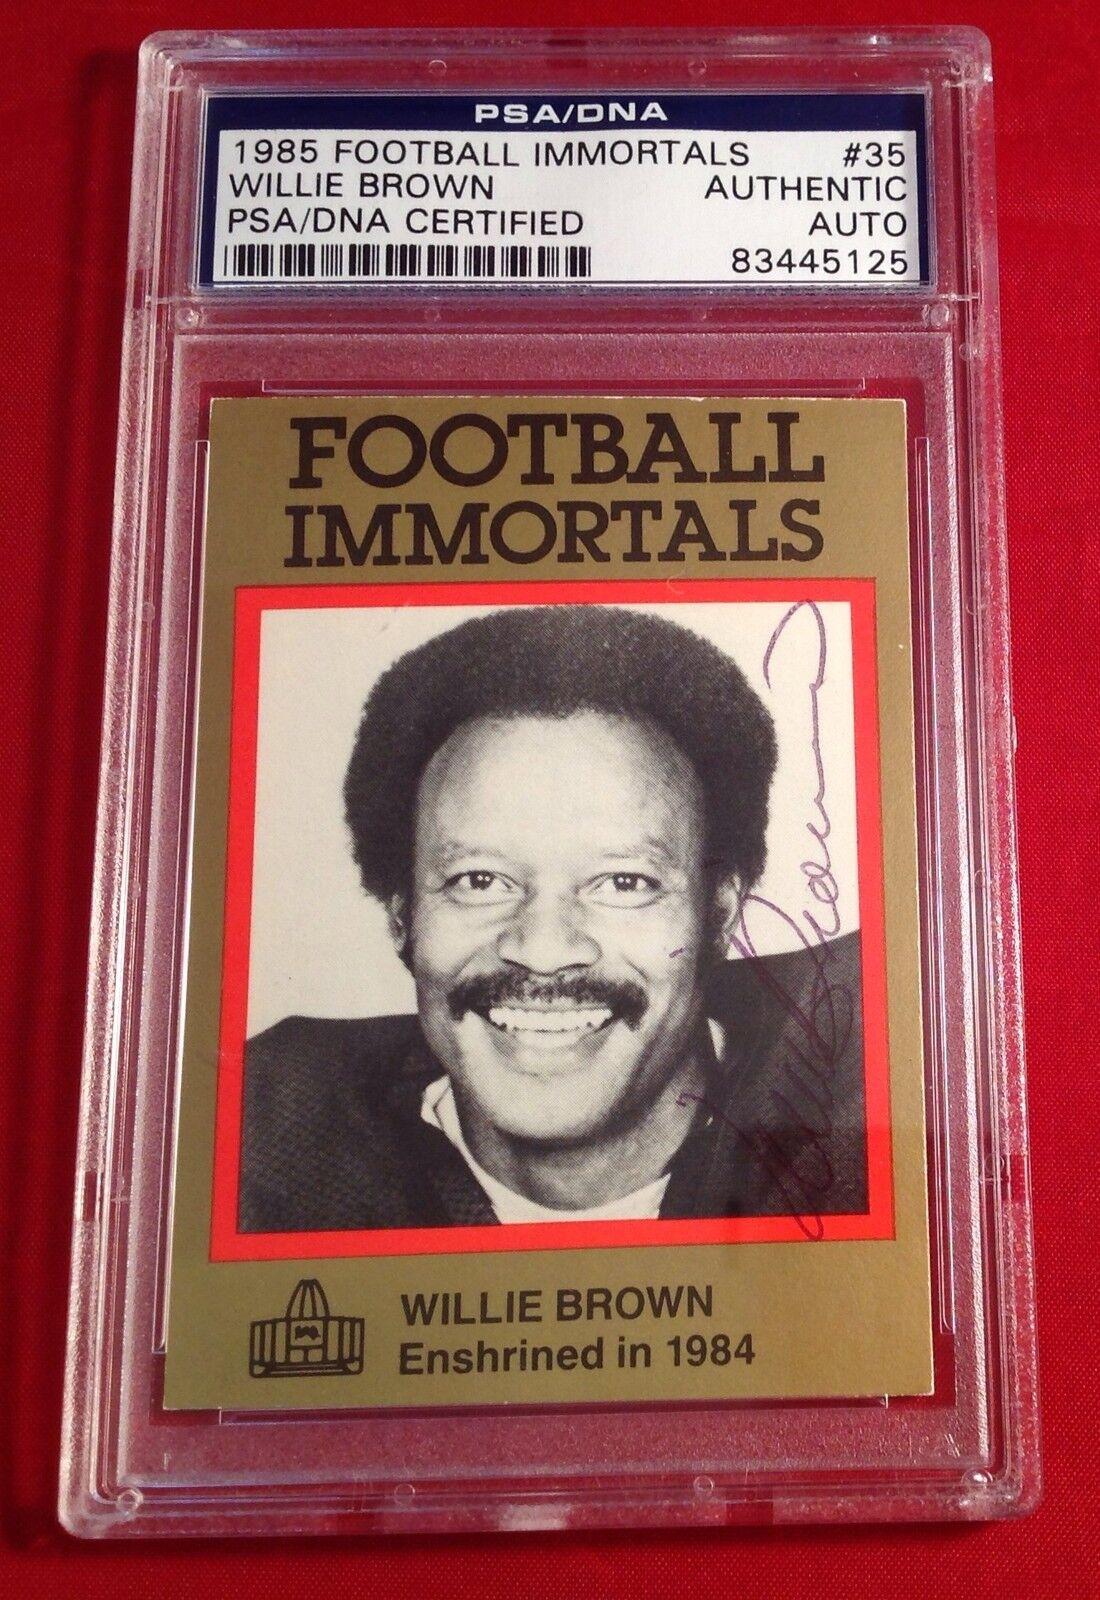 Willie Brown 1985 Football Immortals Card PSA/DNA Slabbed #83445125